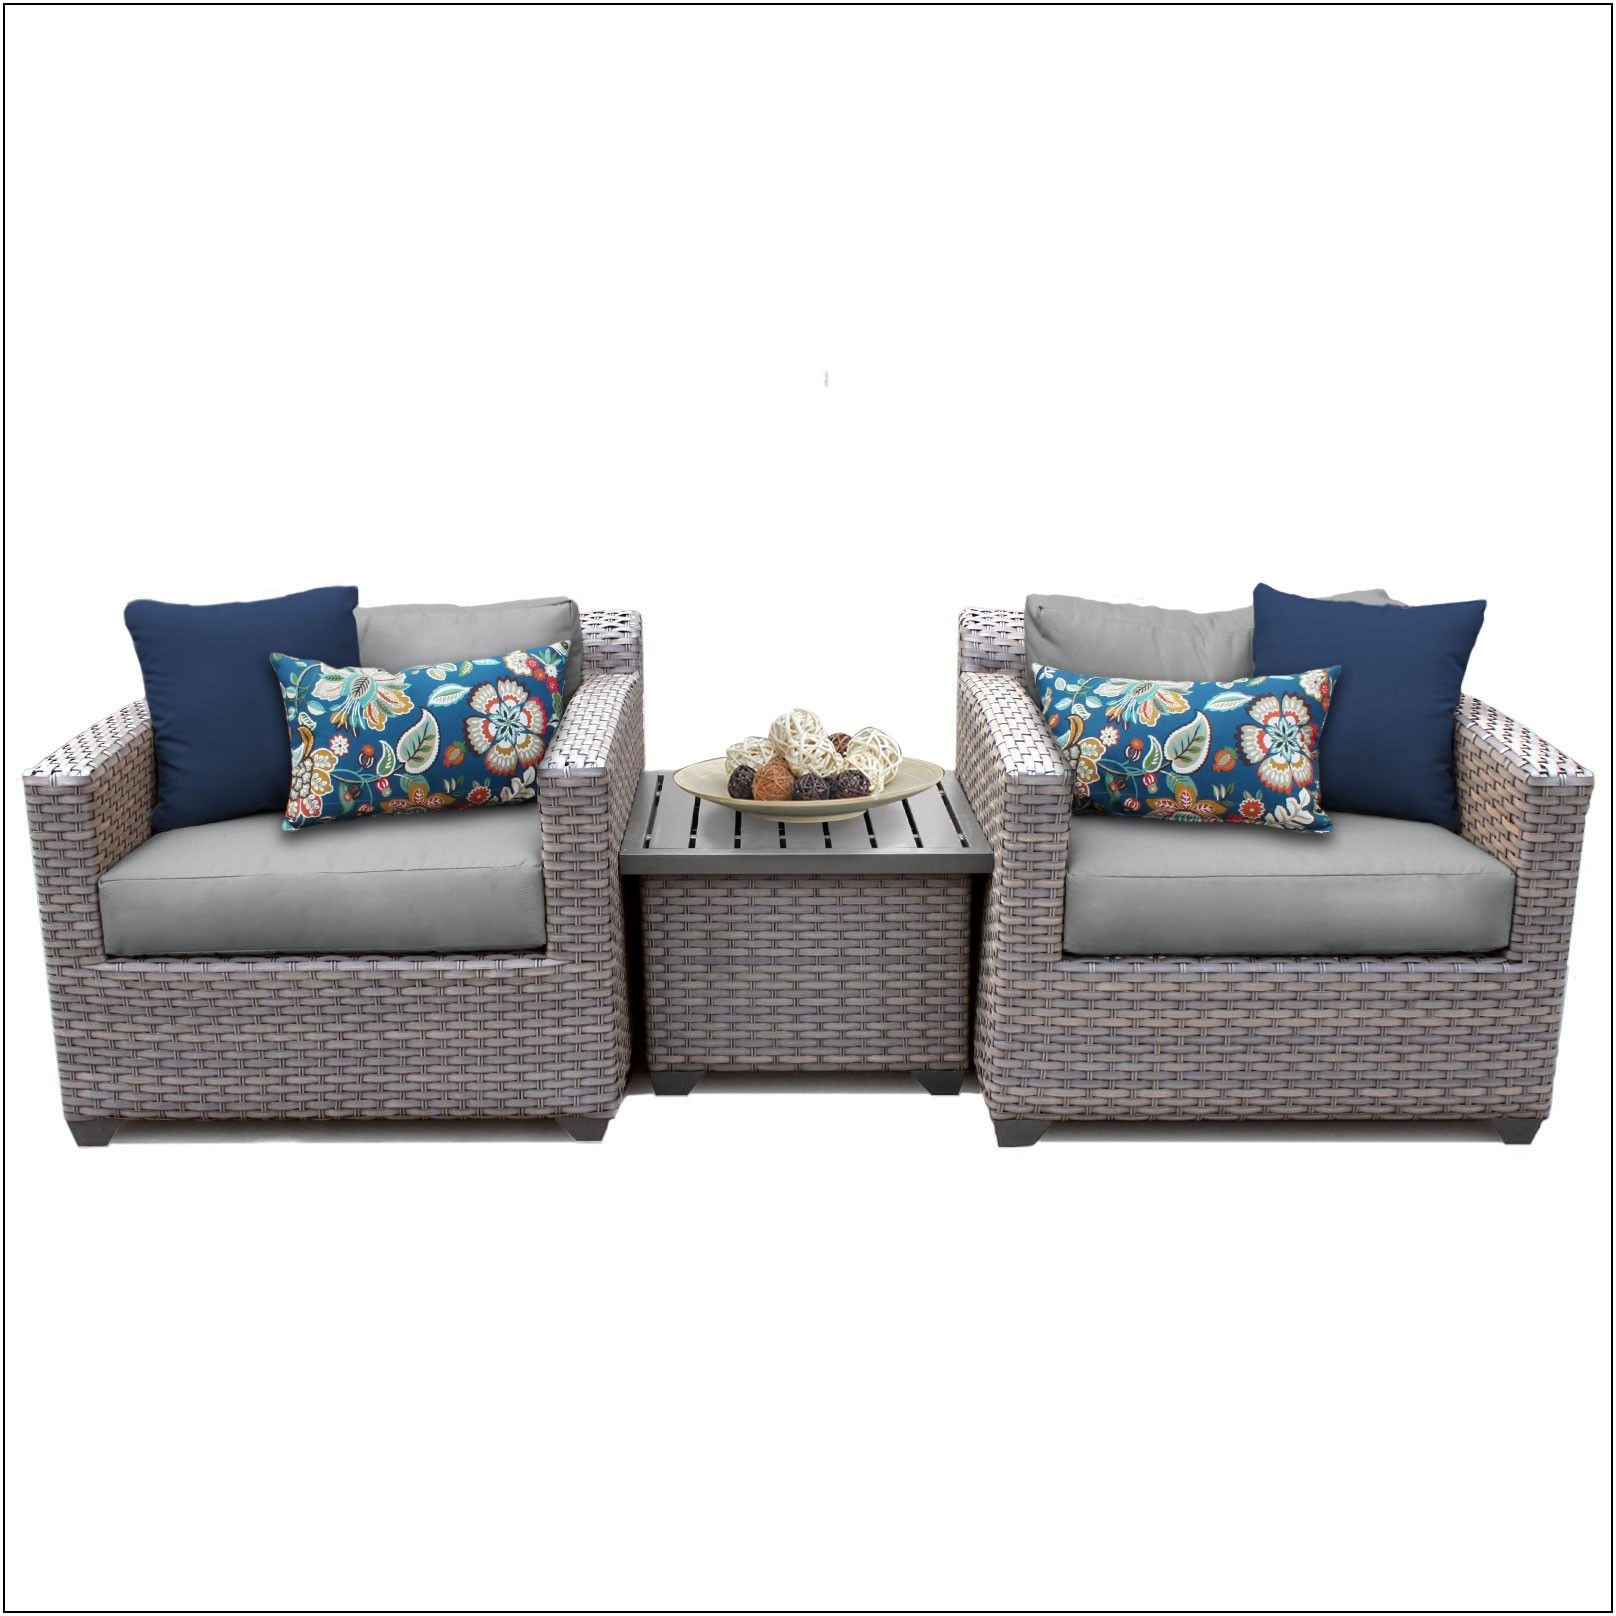 Catalina Wicker Patio Furniture